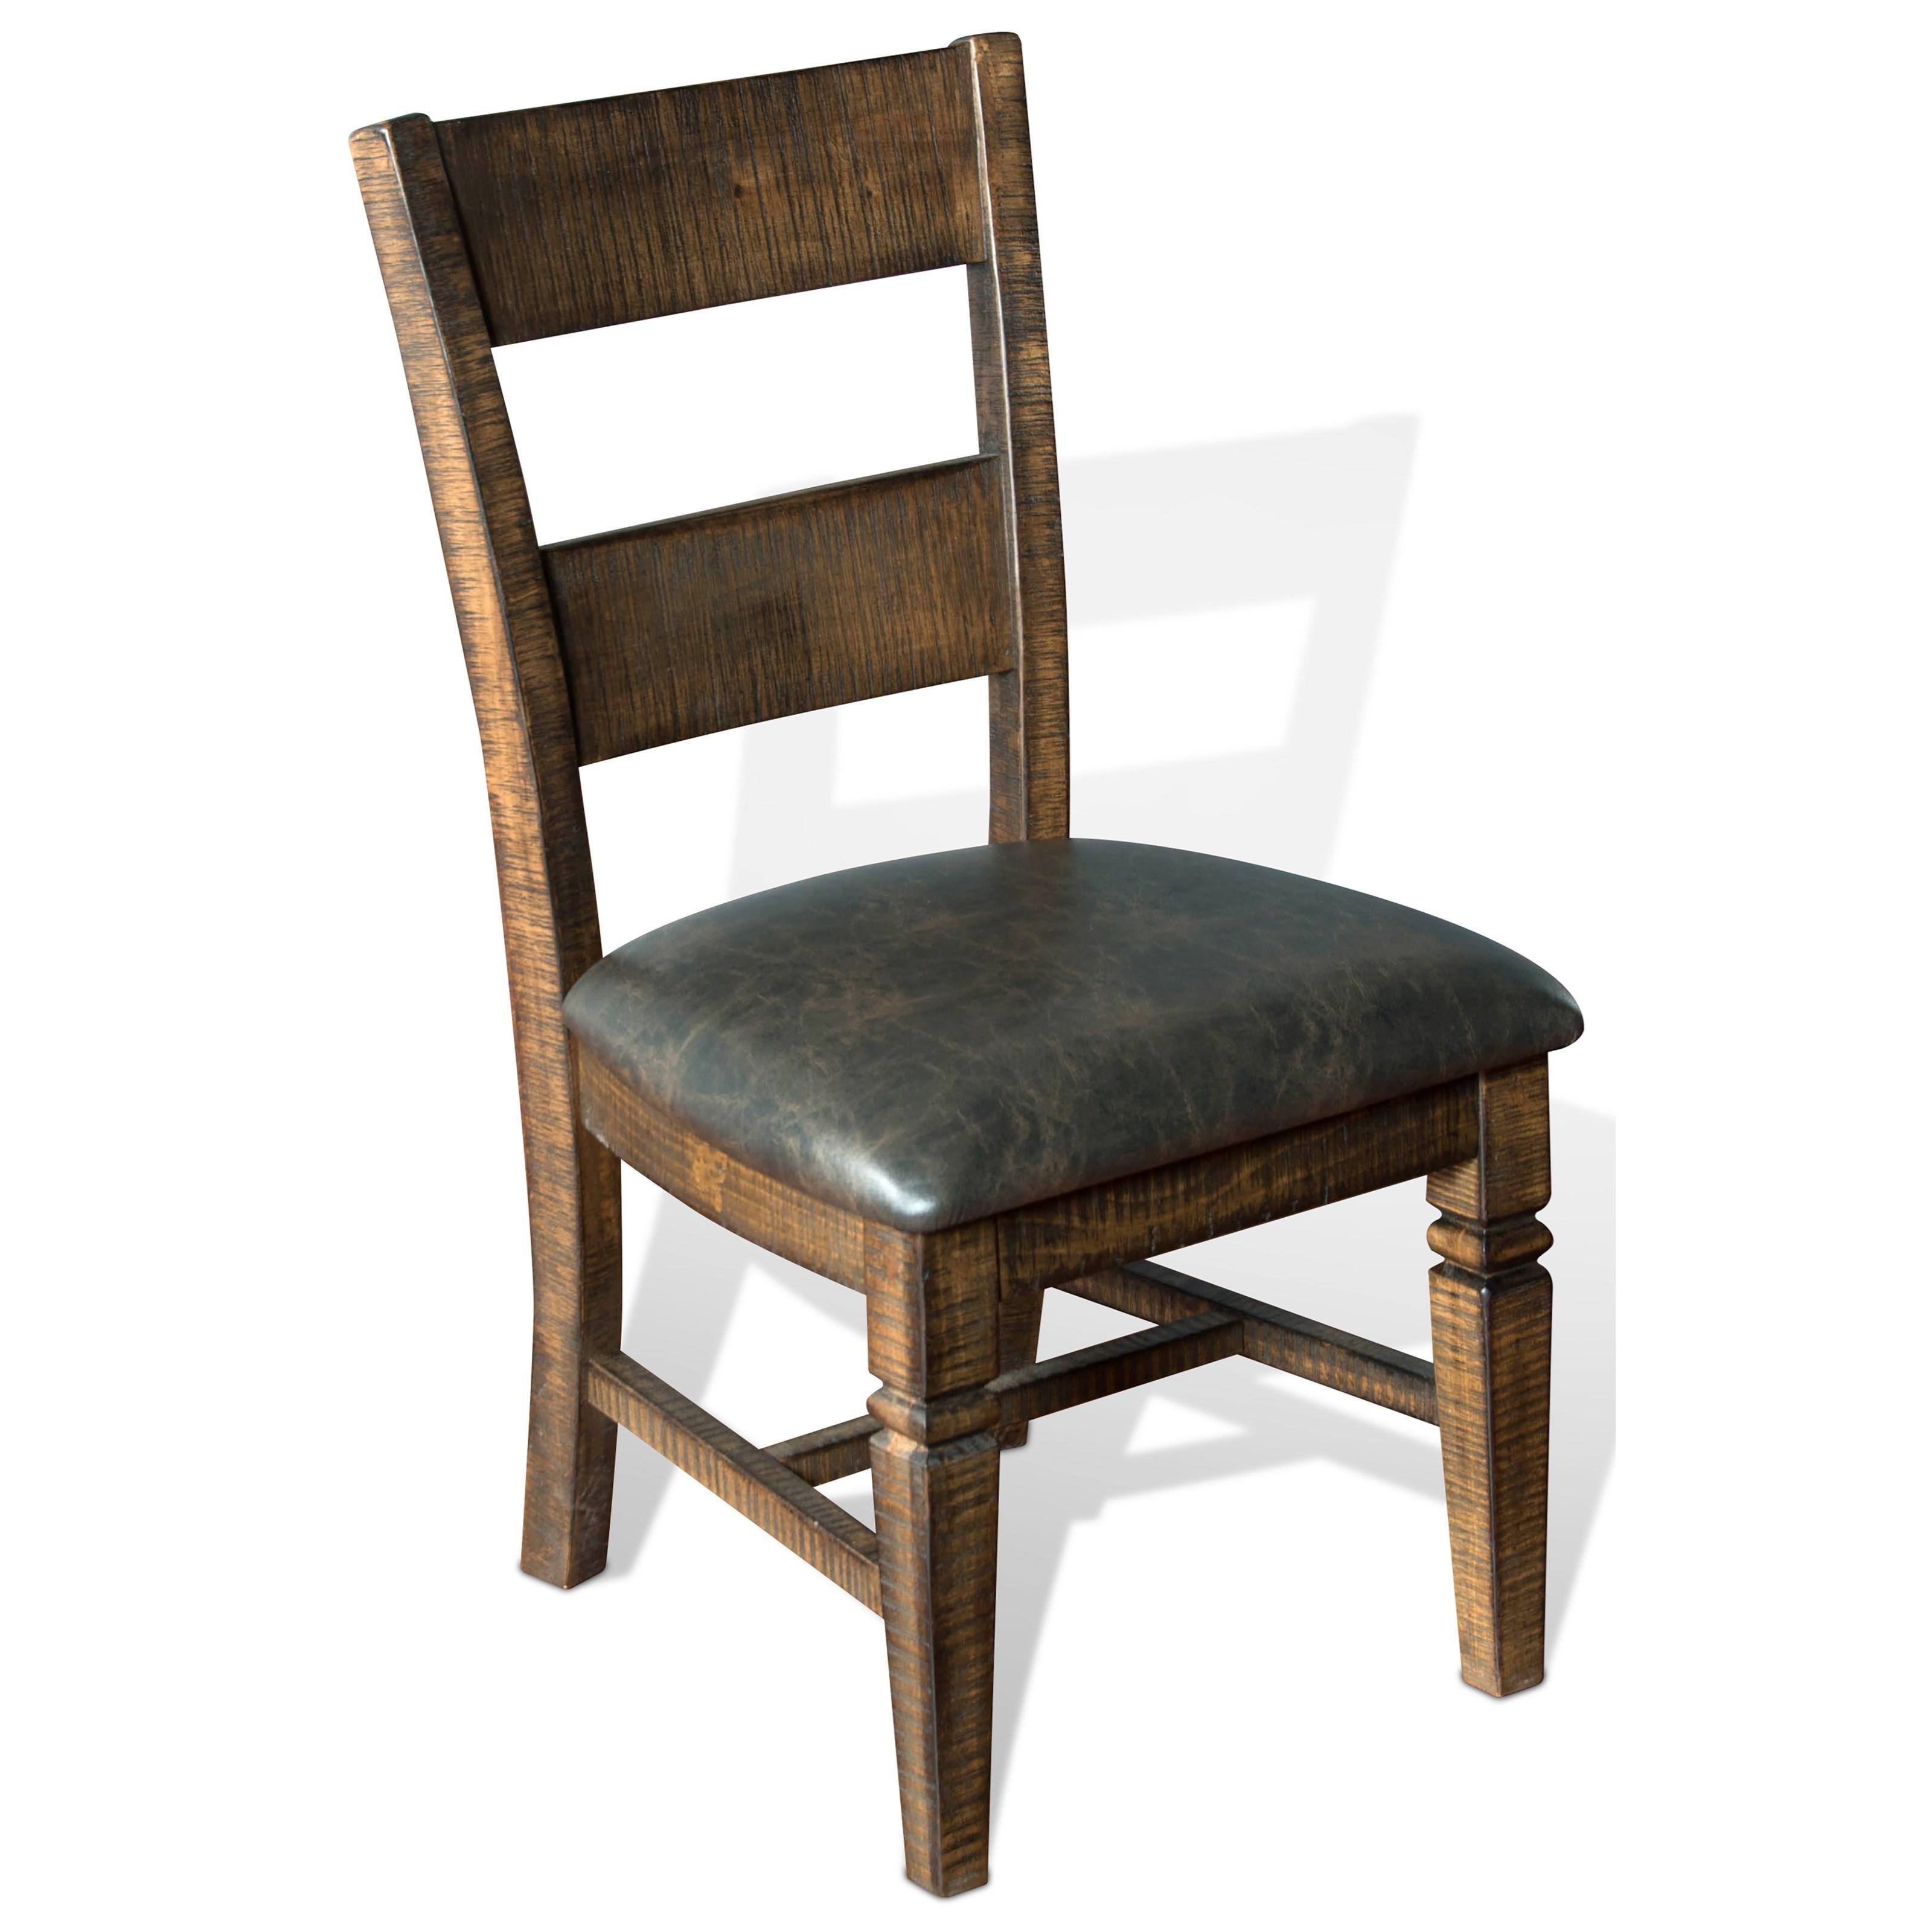 Merveilleux Sunny Designs Homestead Rustic Pine Ladderback Chair W/ Cushion Seat